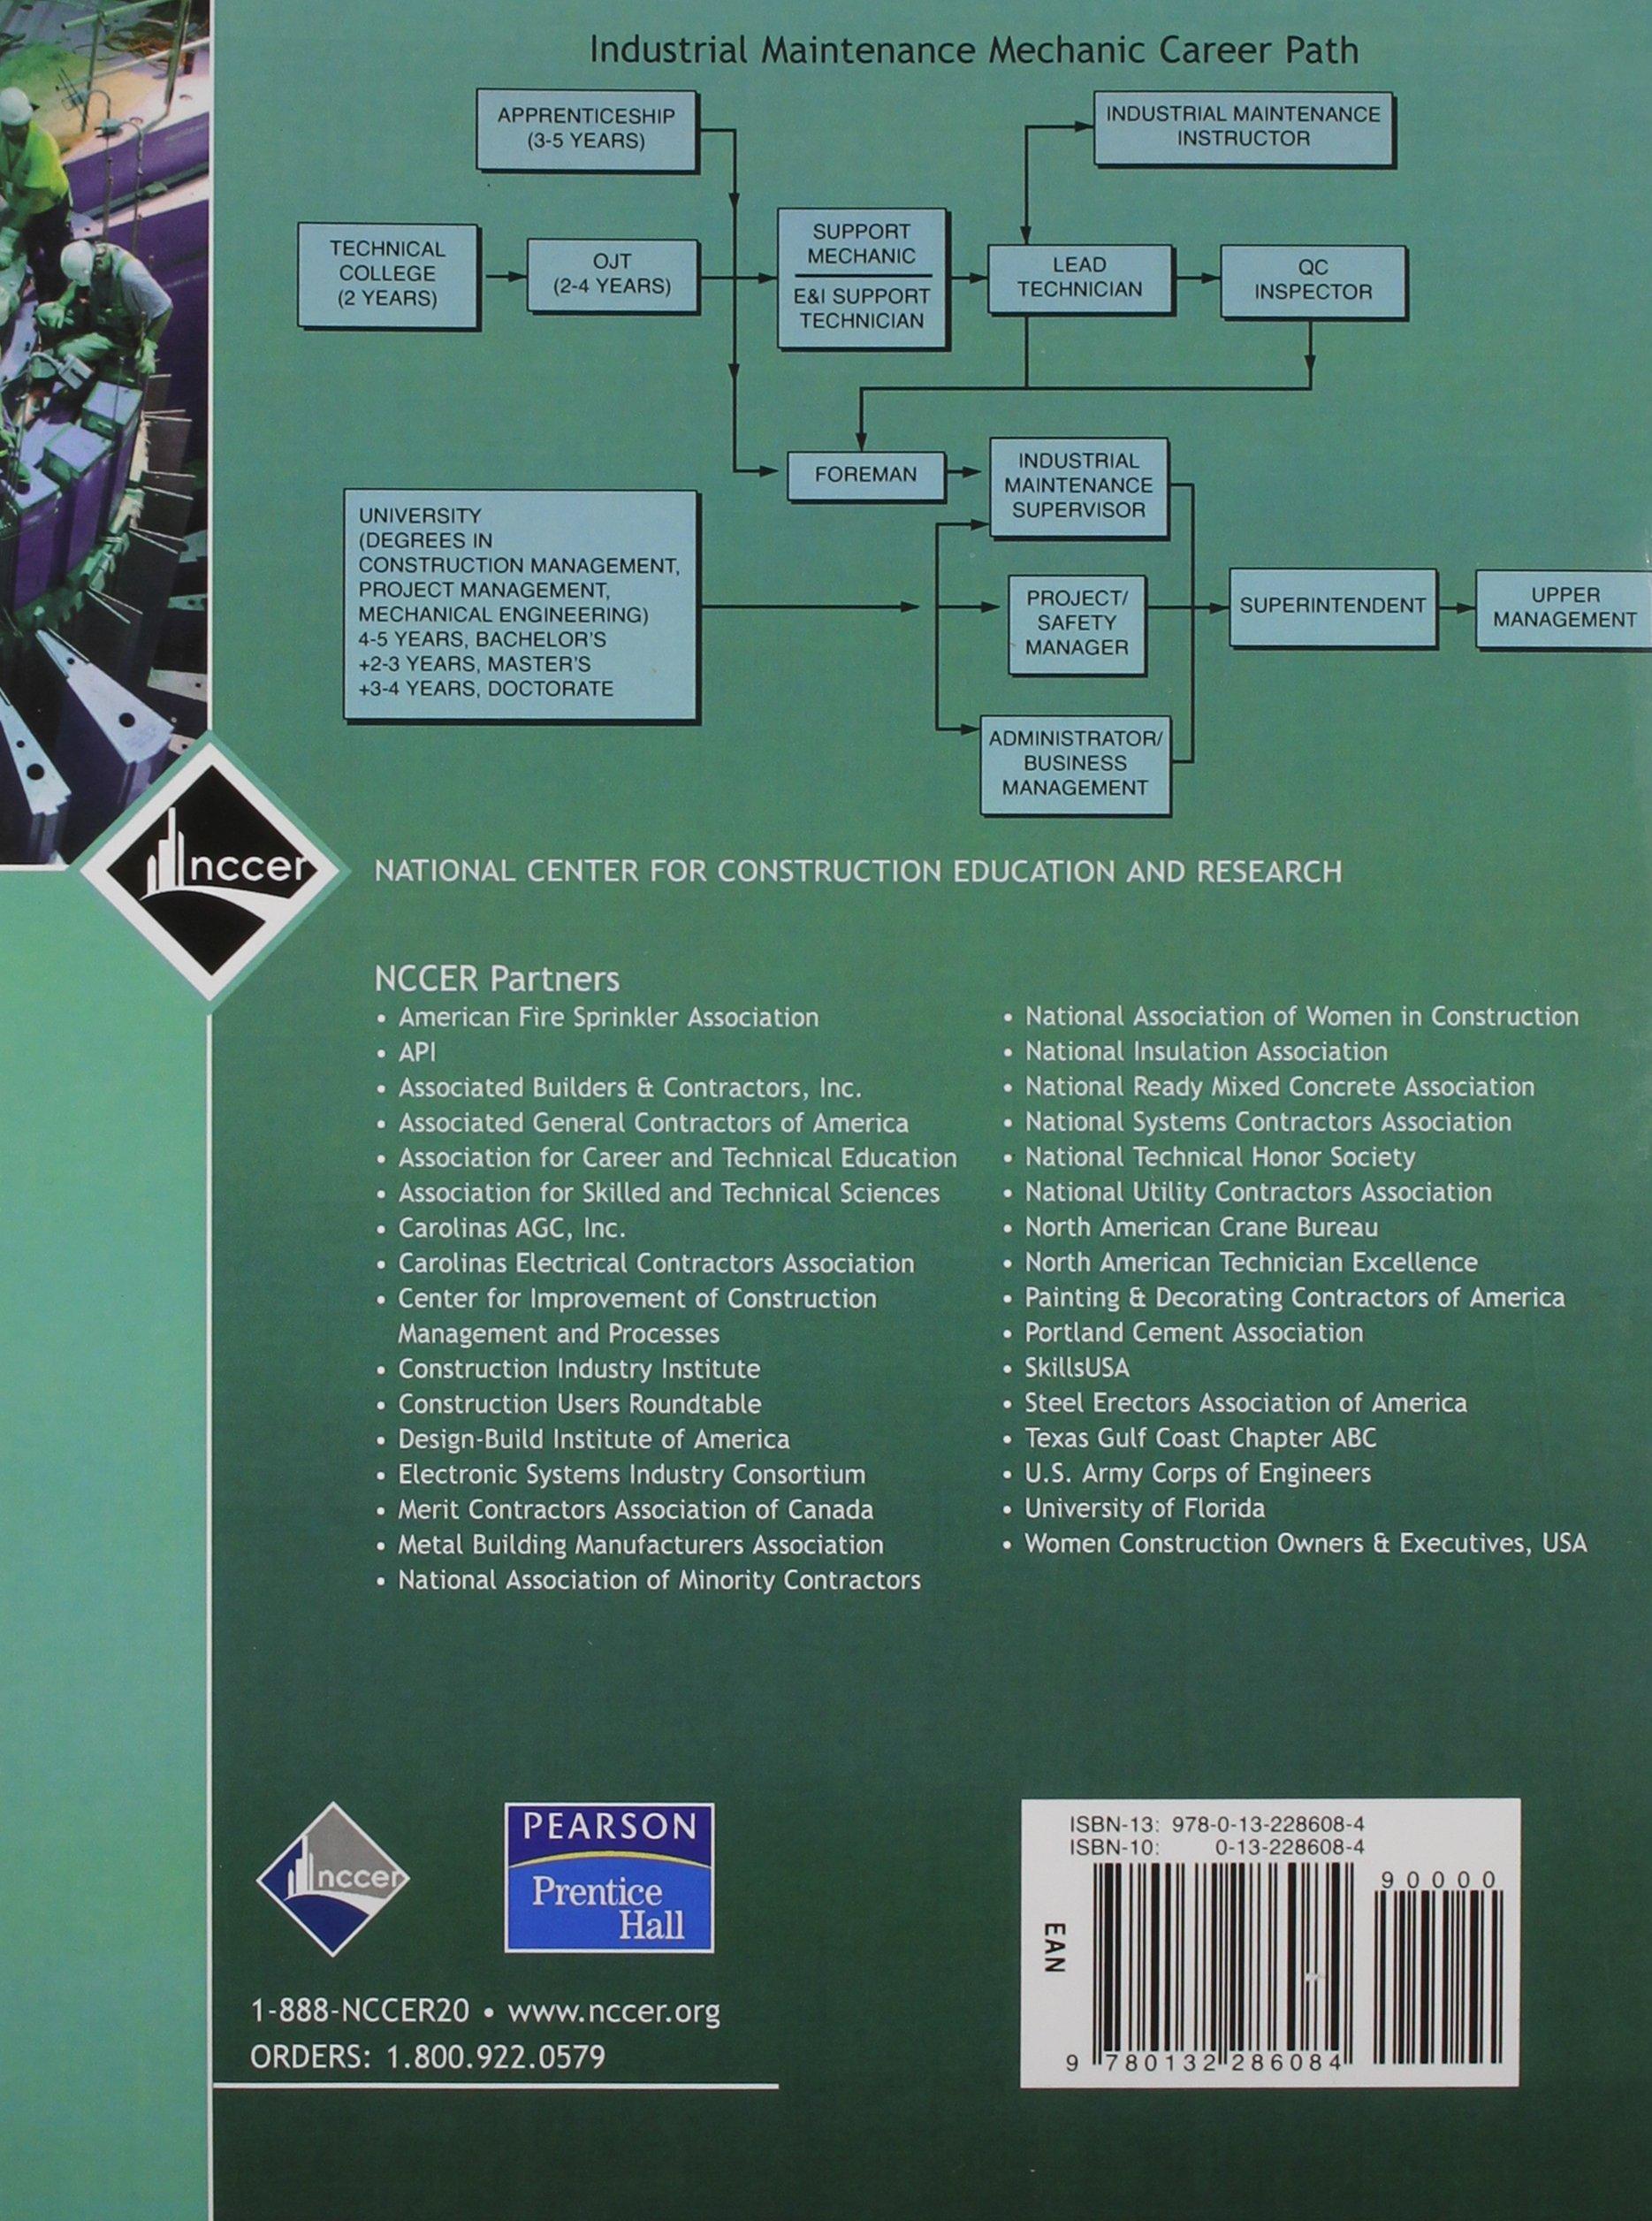 Buy Industrial Maintenance Mechanic Level 1 Trainee Guide